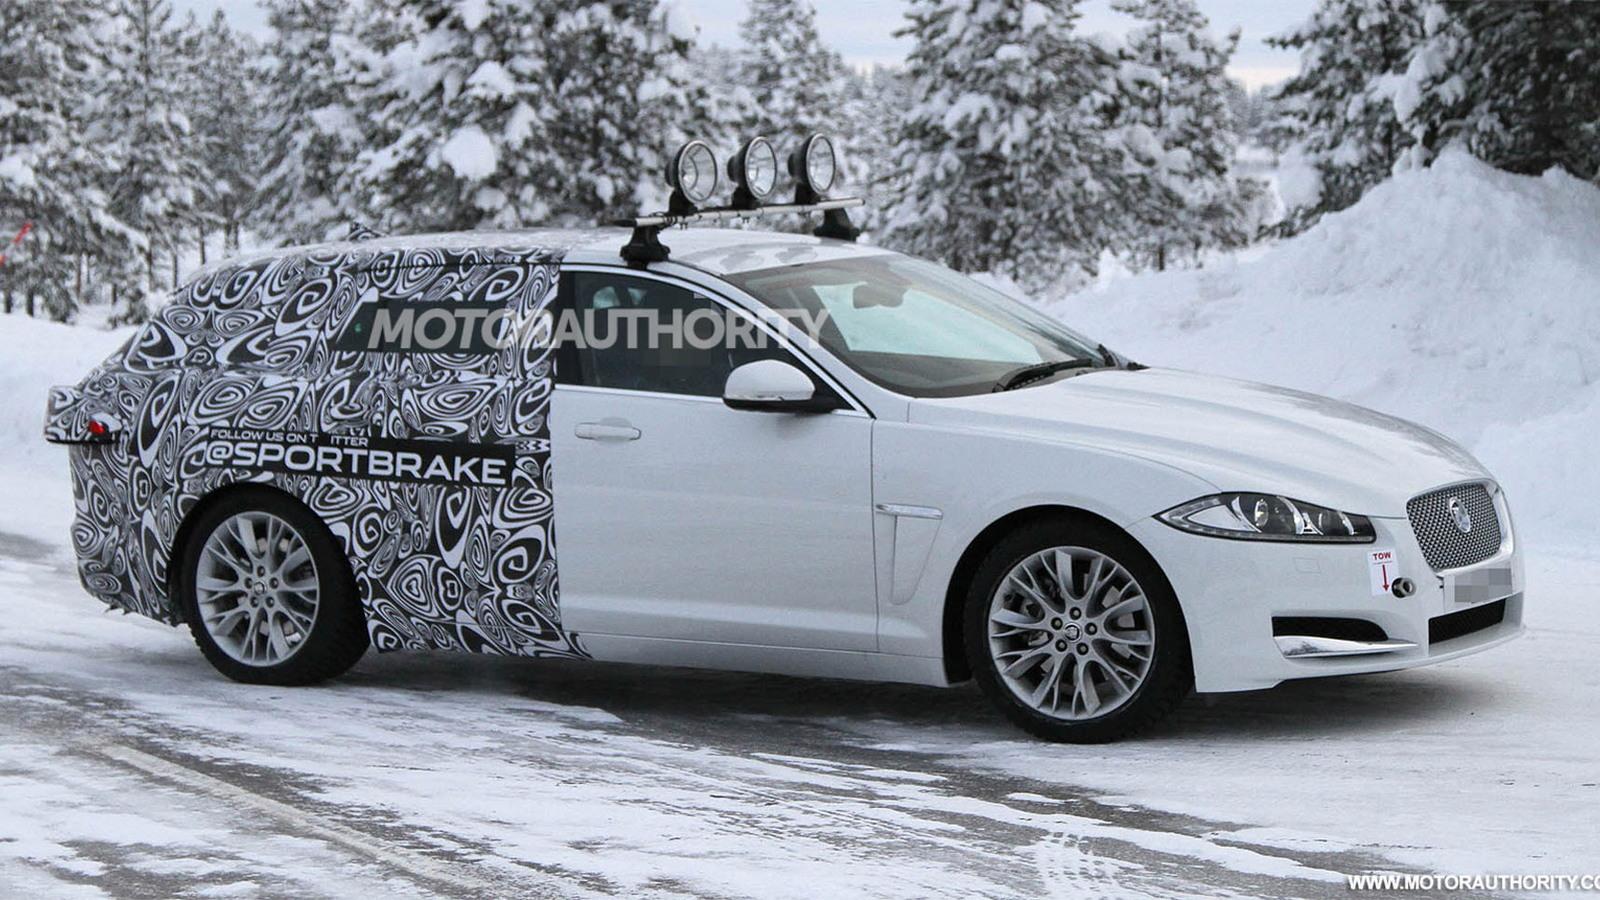 2013 Jaguar XF Sportbrake spy shots